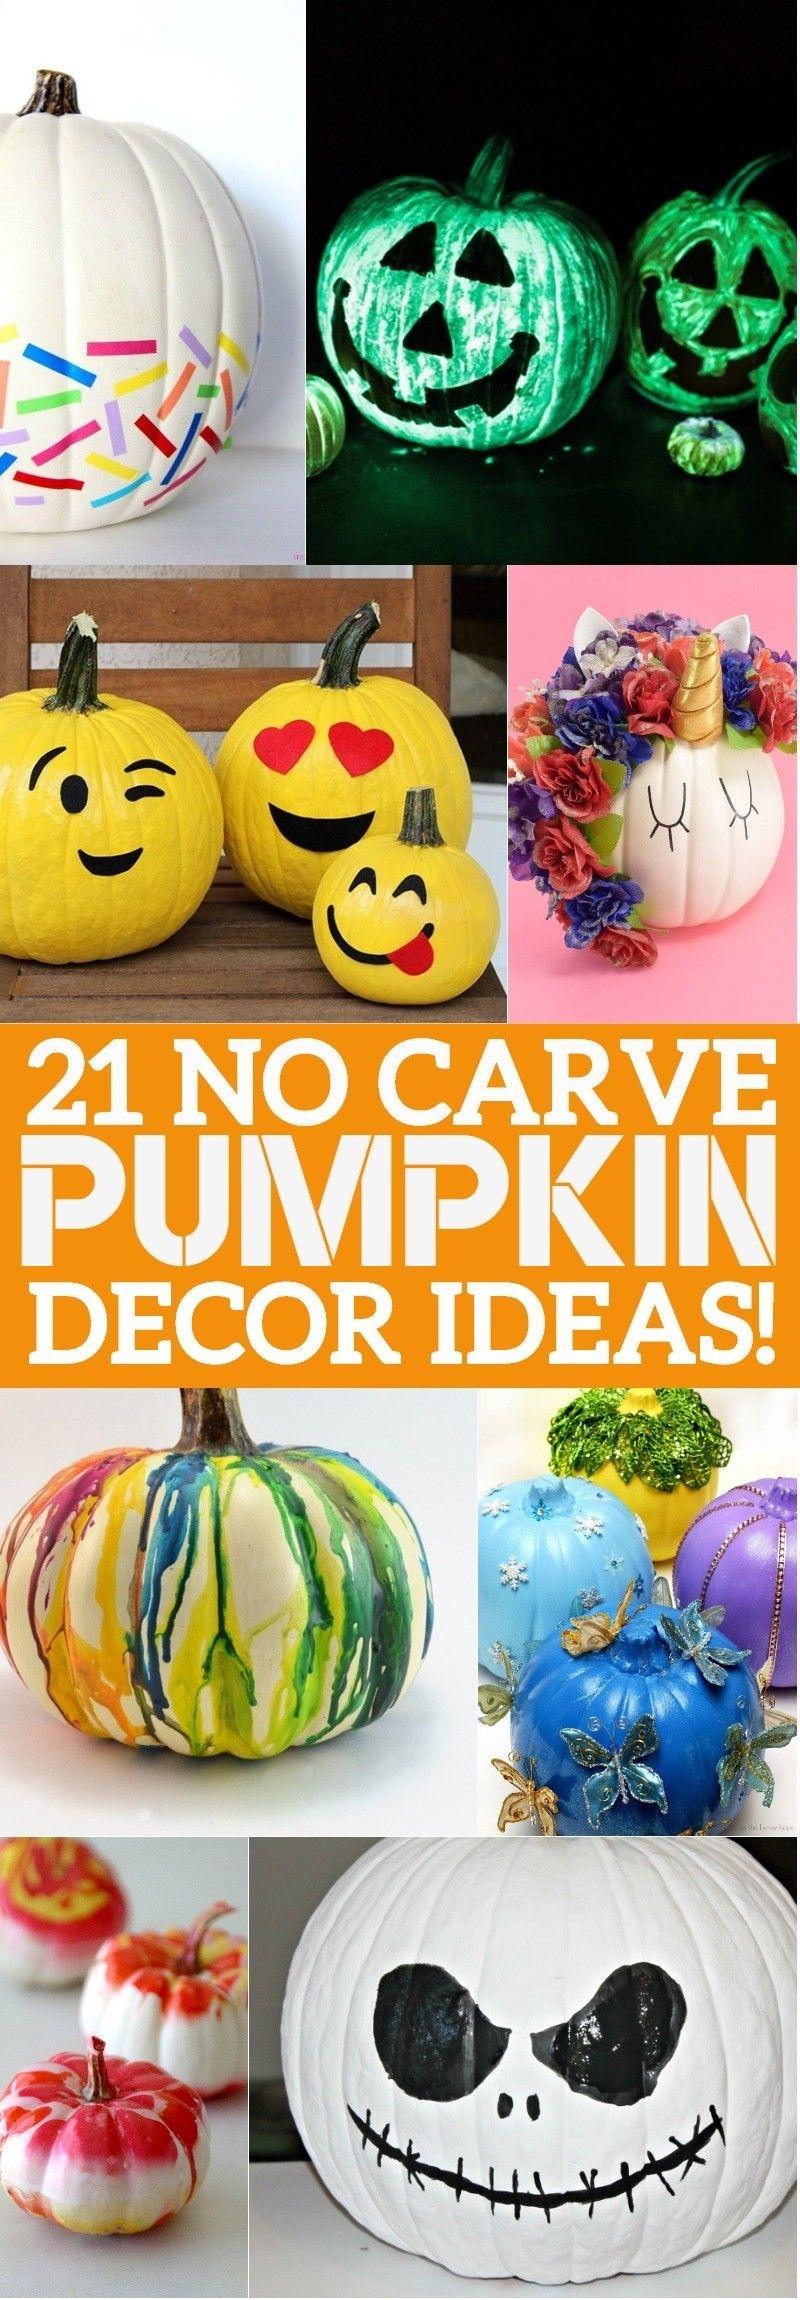 21 No Carve Pumpkin Decorating Ideas That You'll LOVE This Halloween! #pumpkinpaintingideas